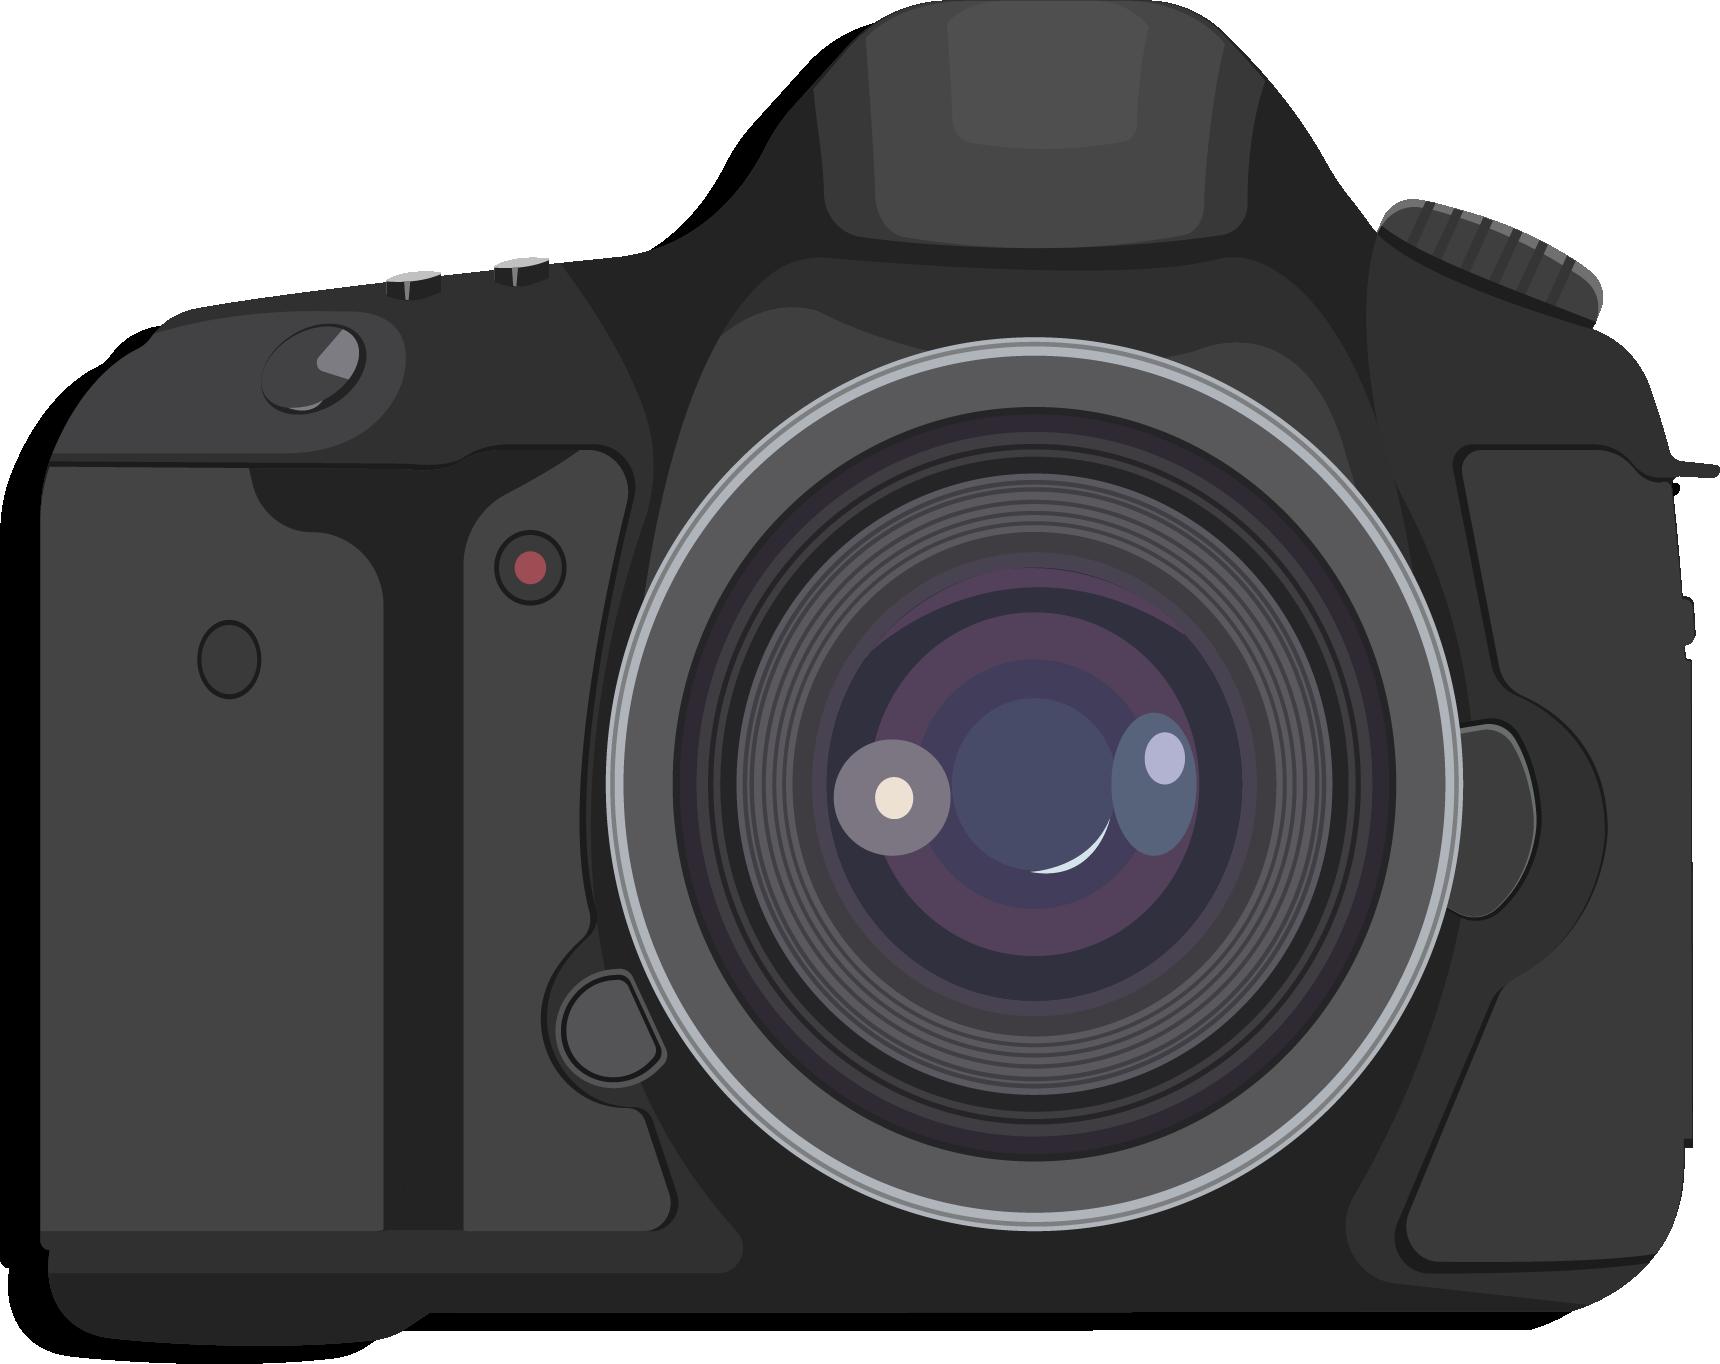 Camera clipart #5, Download drawings